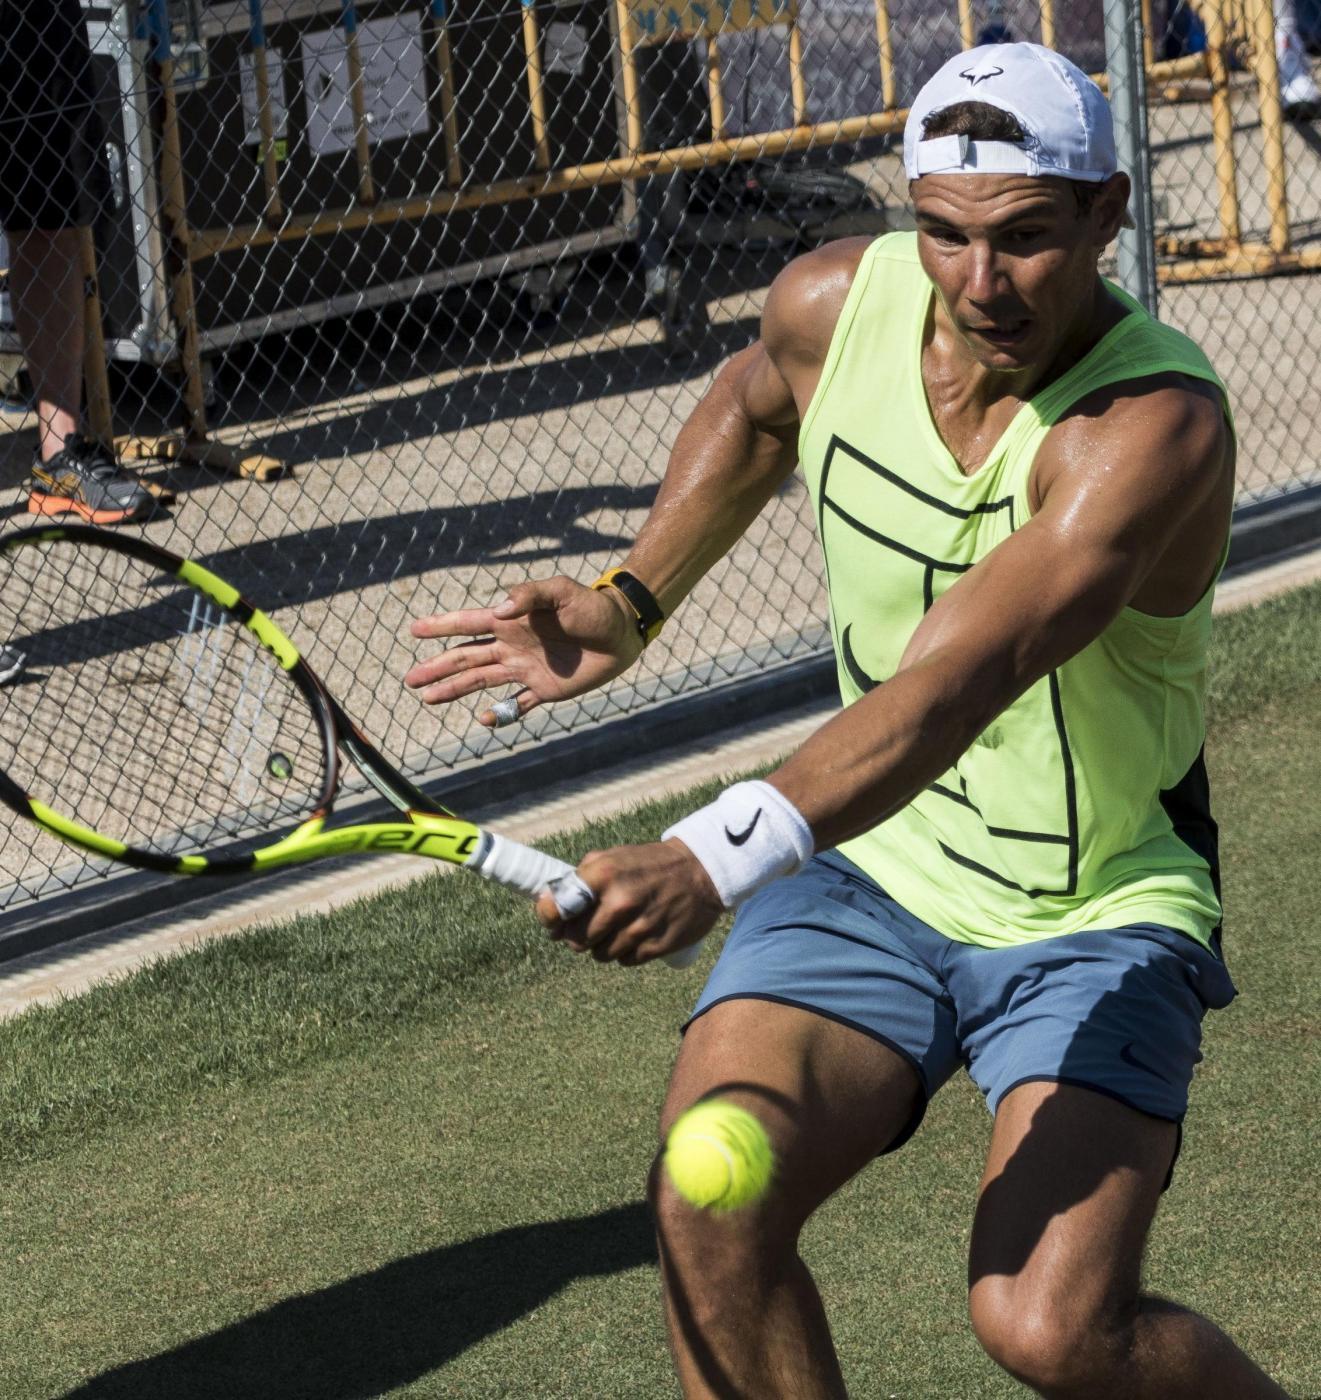 Wimbledon, Rafa Nadal si prepara per l'erba